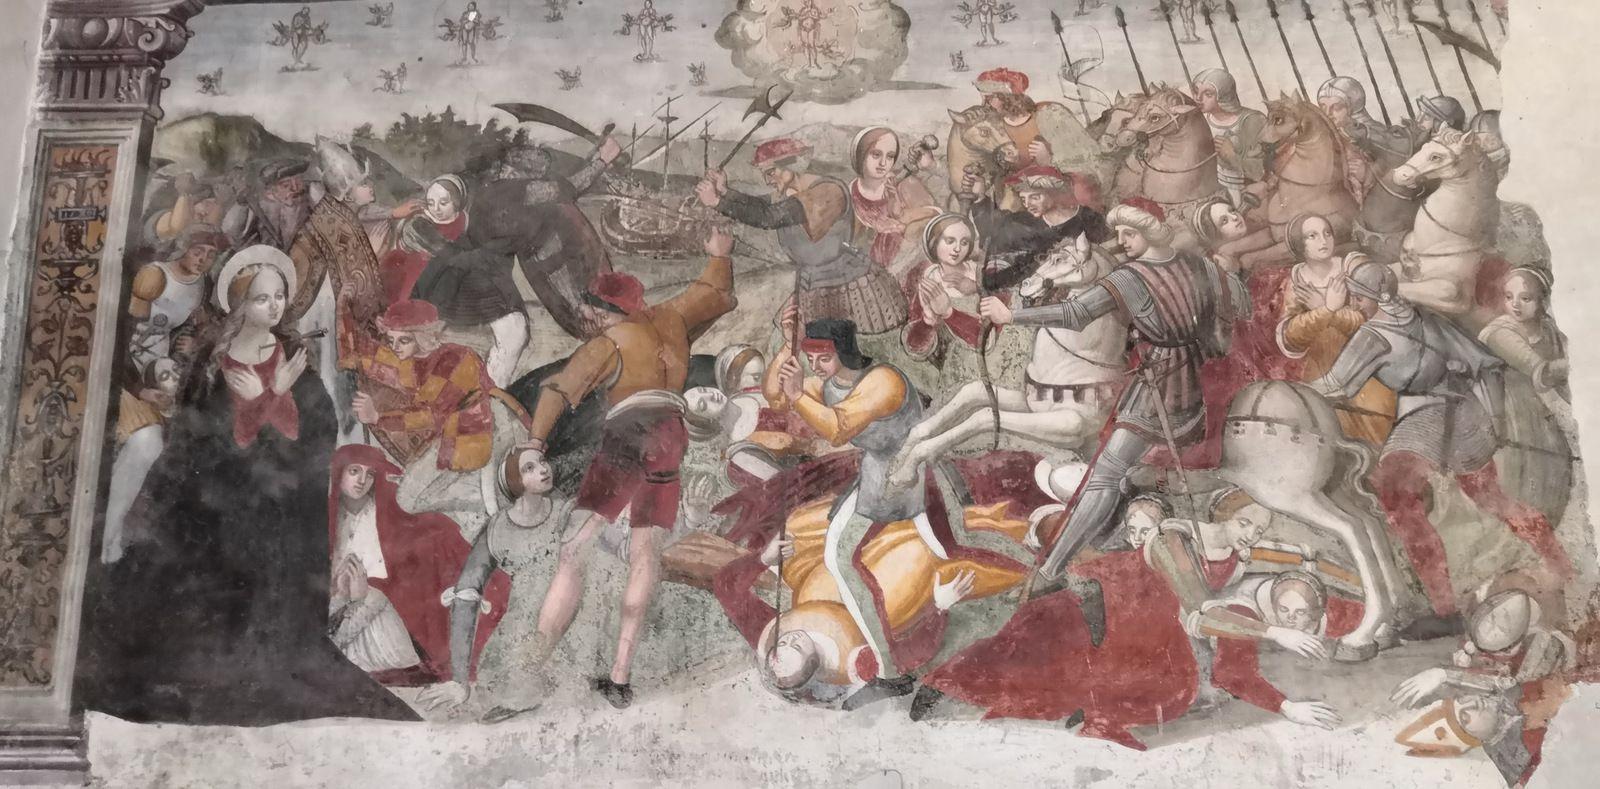 The Martyrdom of Saint Ursula, Fresco, 16th century